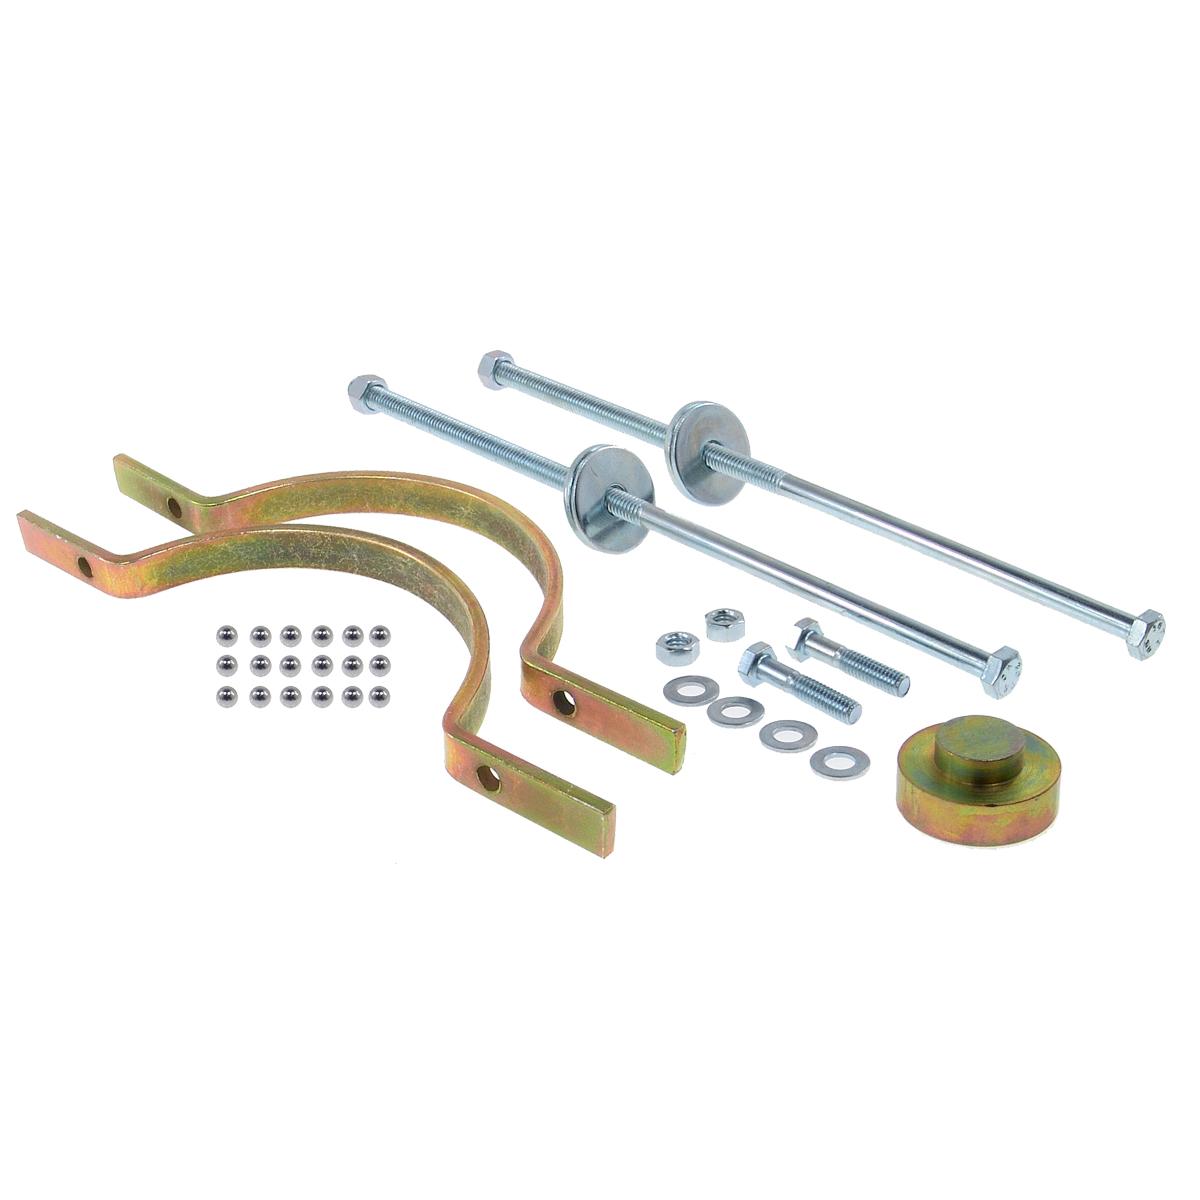 jf010e cvt pulley tool